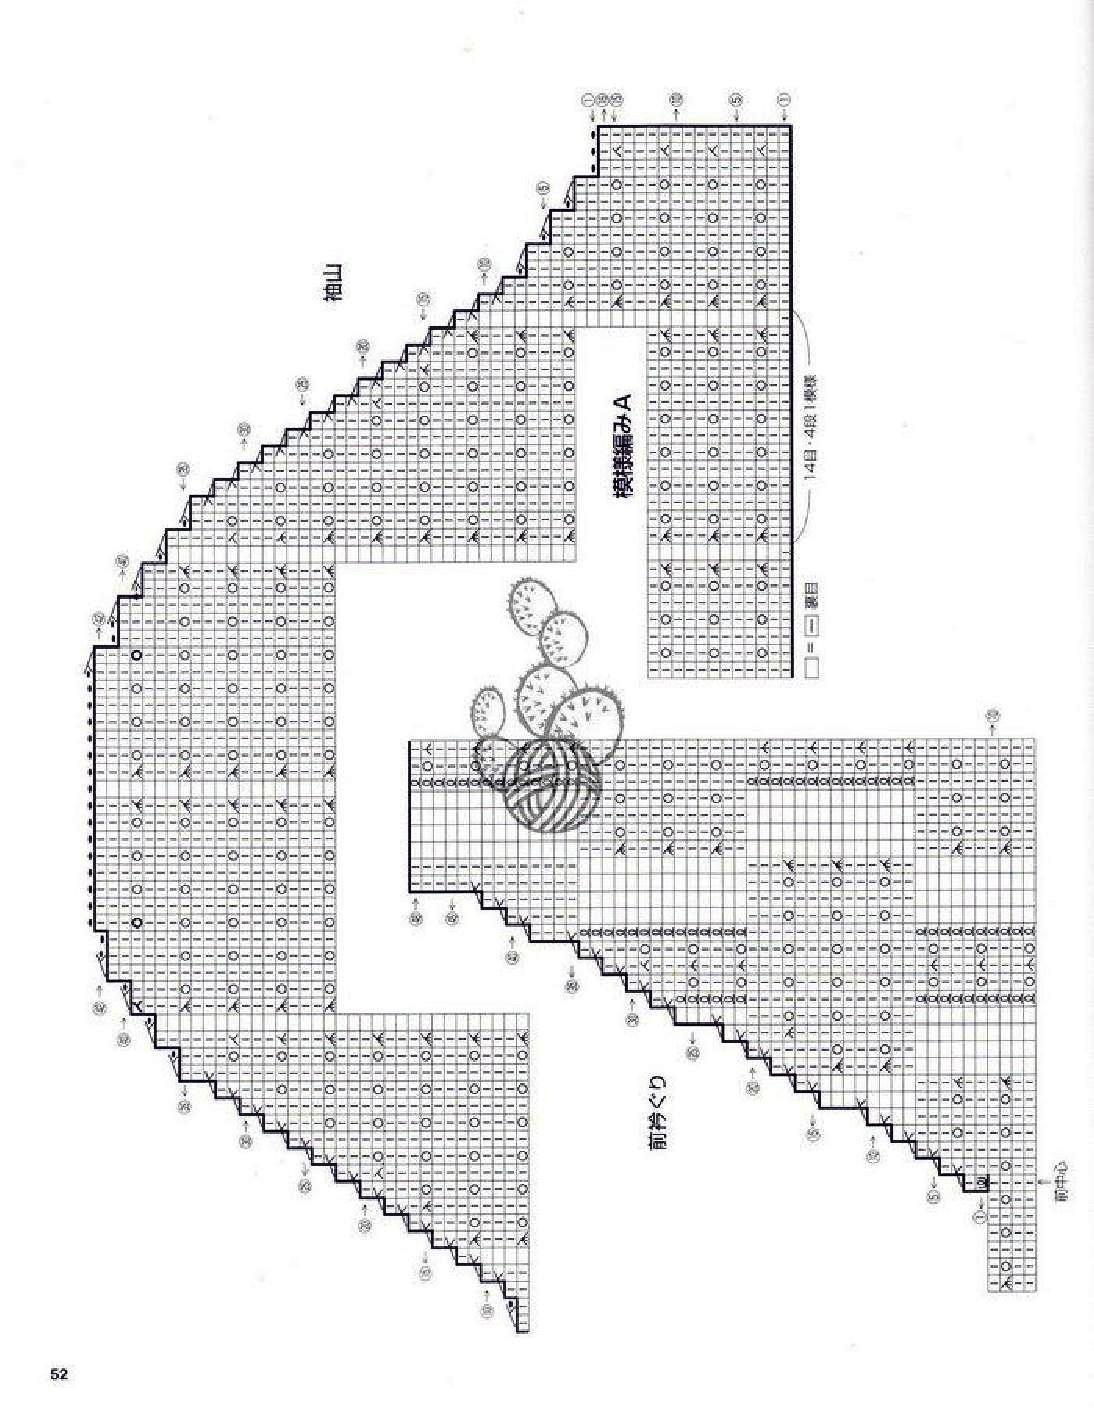 NV80258_page52_image1.jpg